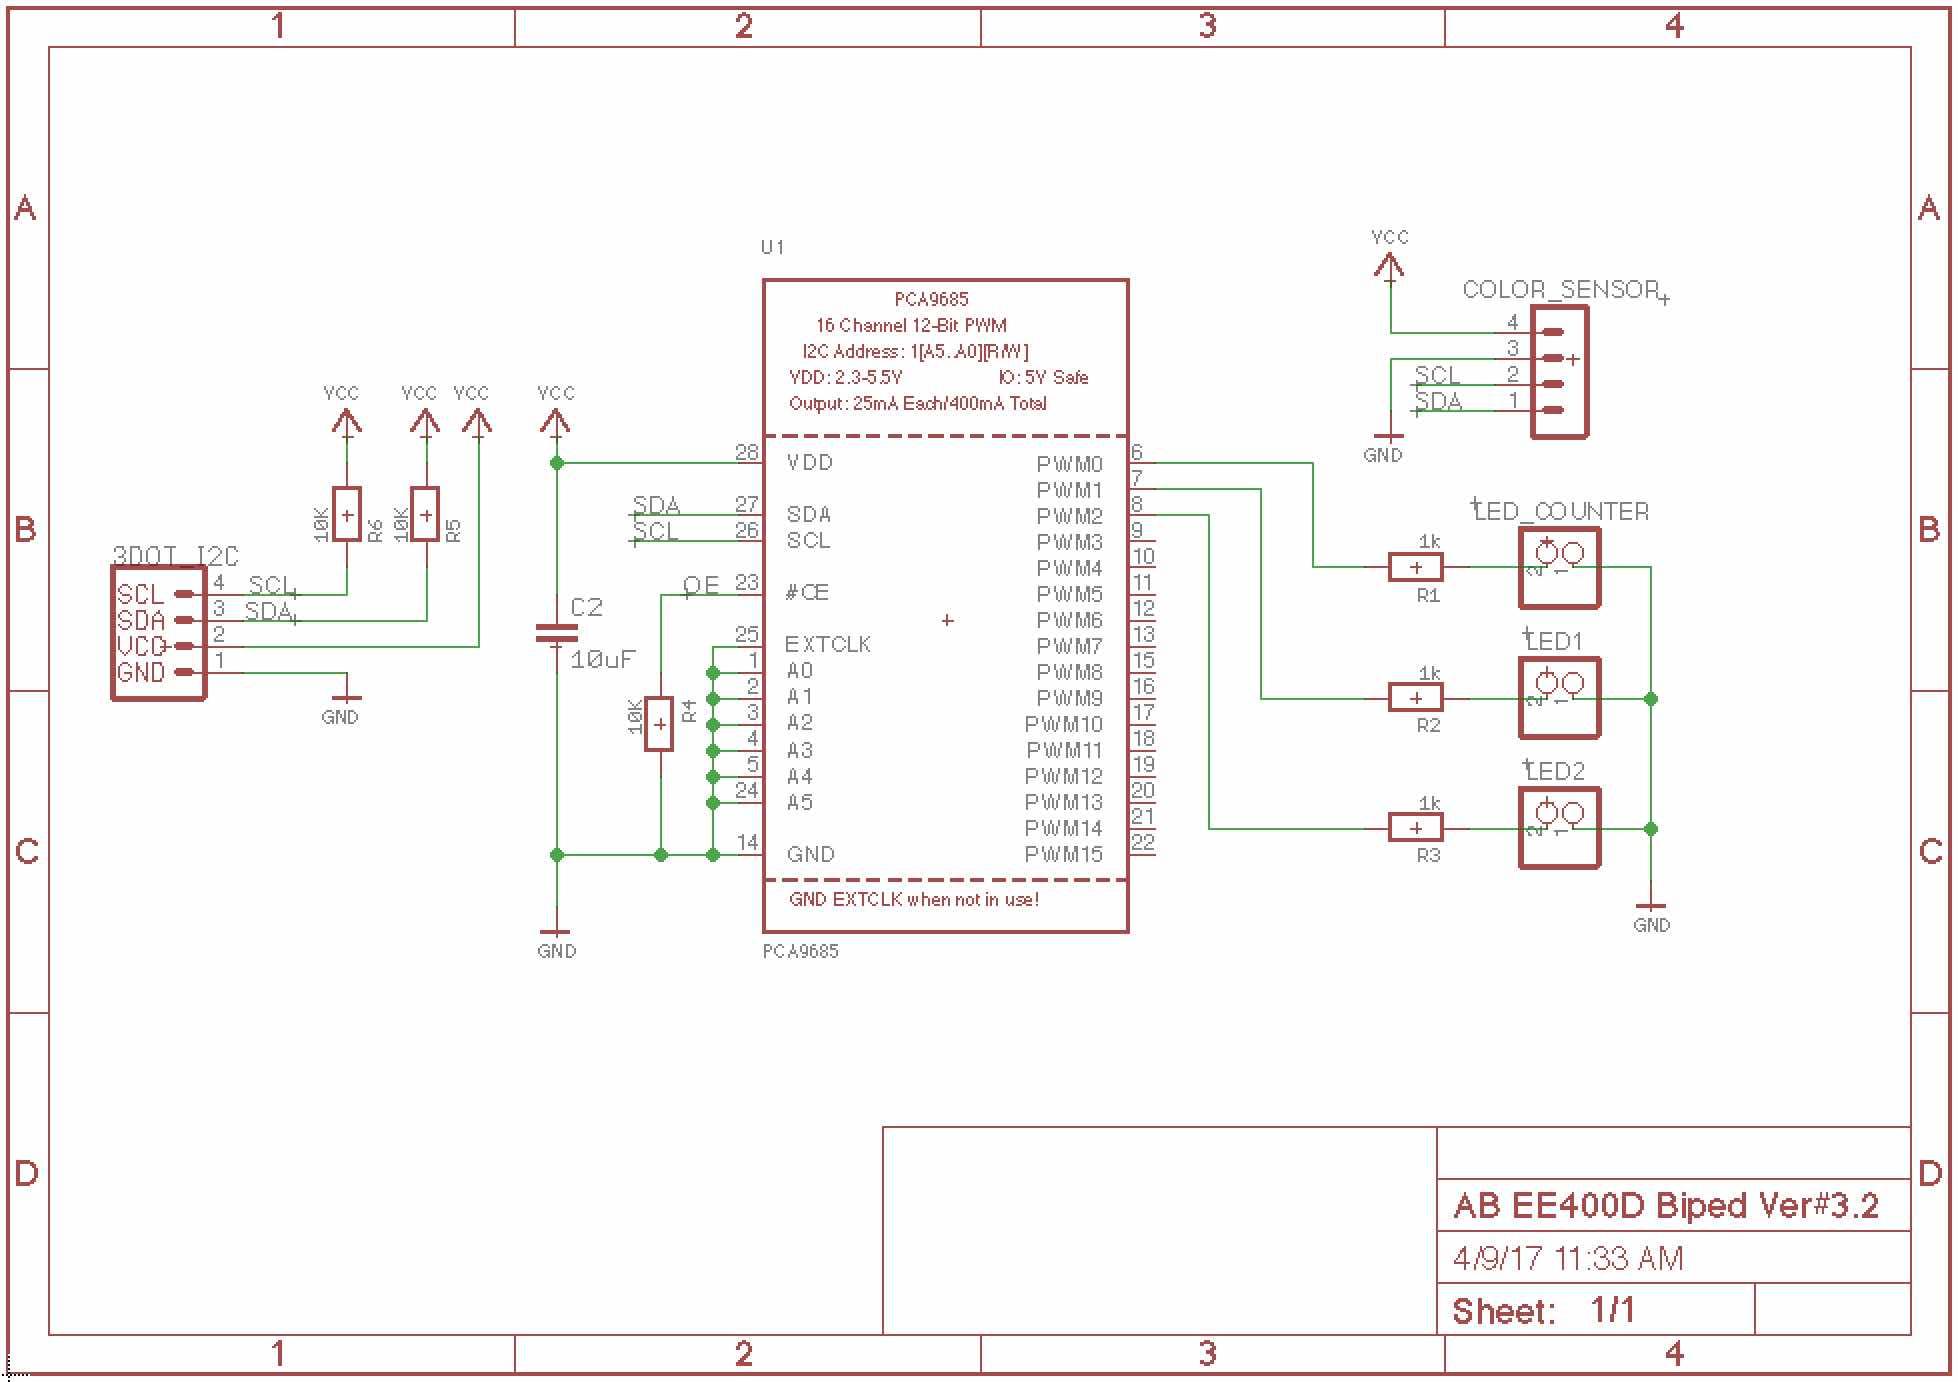 Spring 2017 BiPed - PCB Schematic - Arxterra